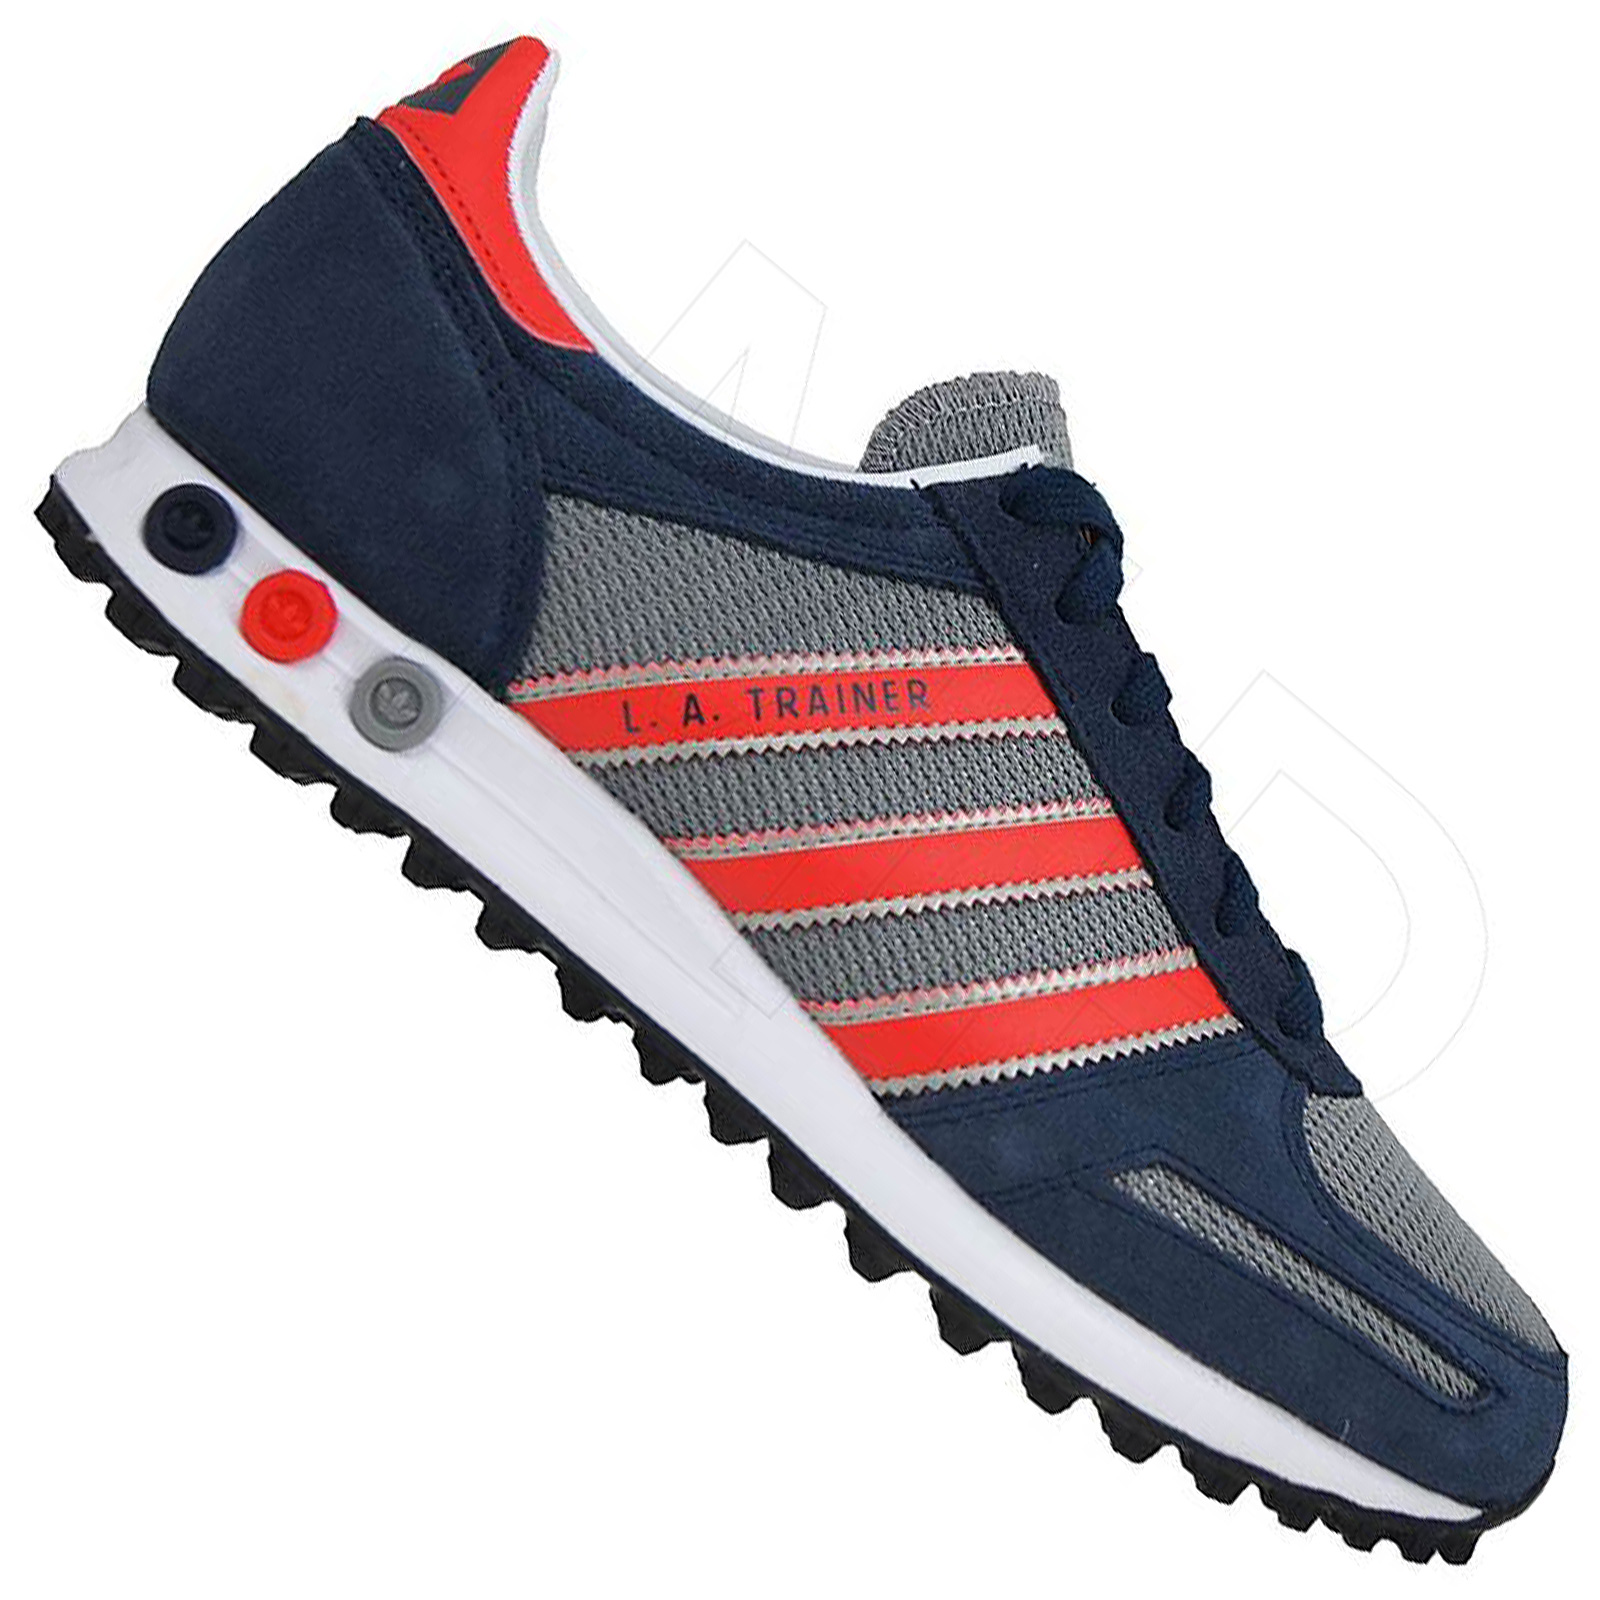 7134e965163714 adidas Originals La Trainer Sneaker Freizeit Schuhe Navy Grau Rot 41 ...